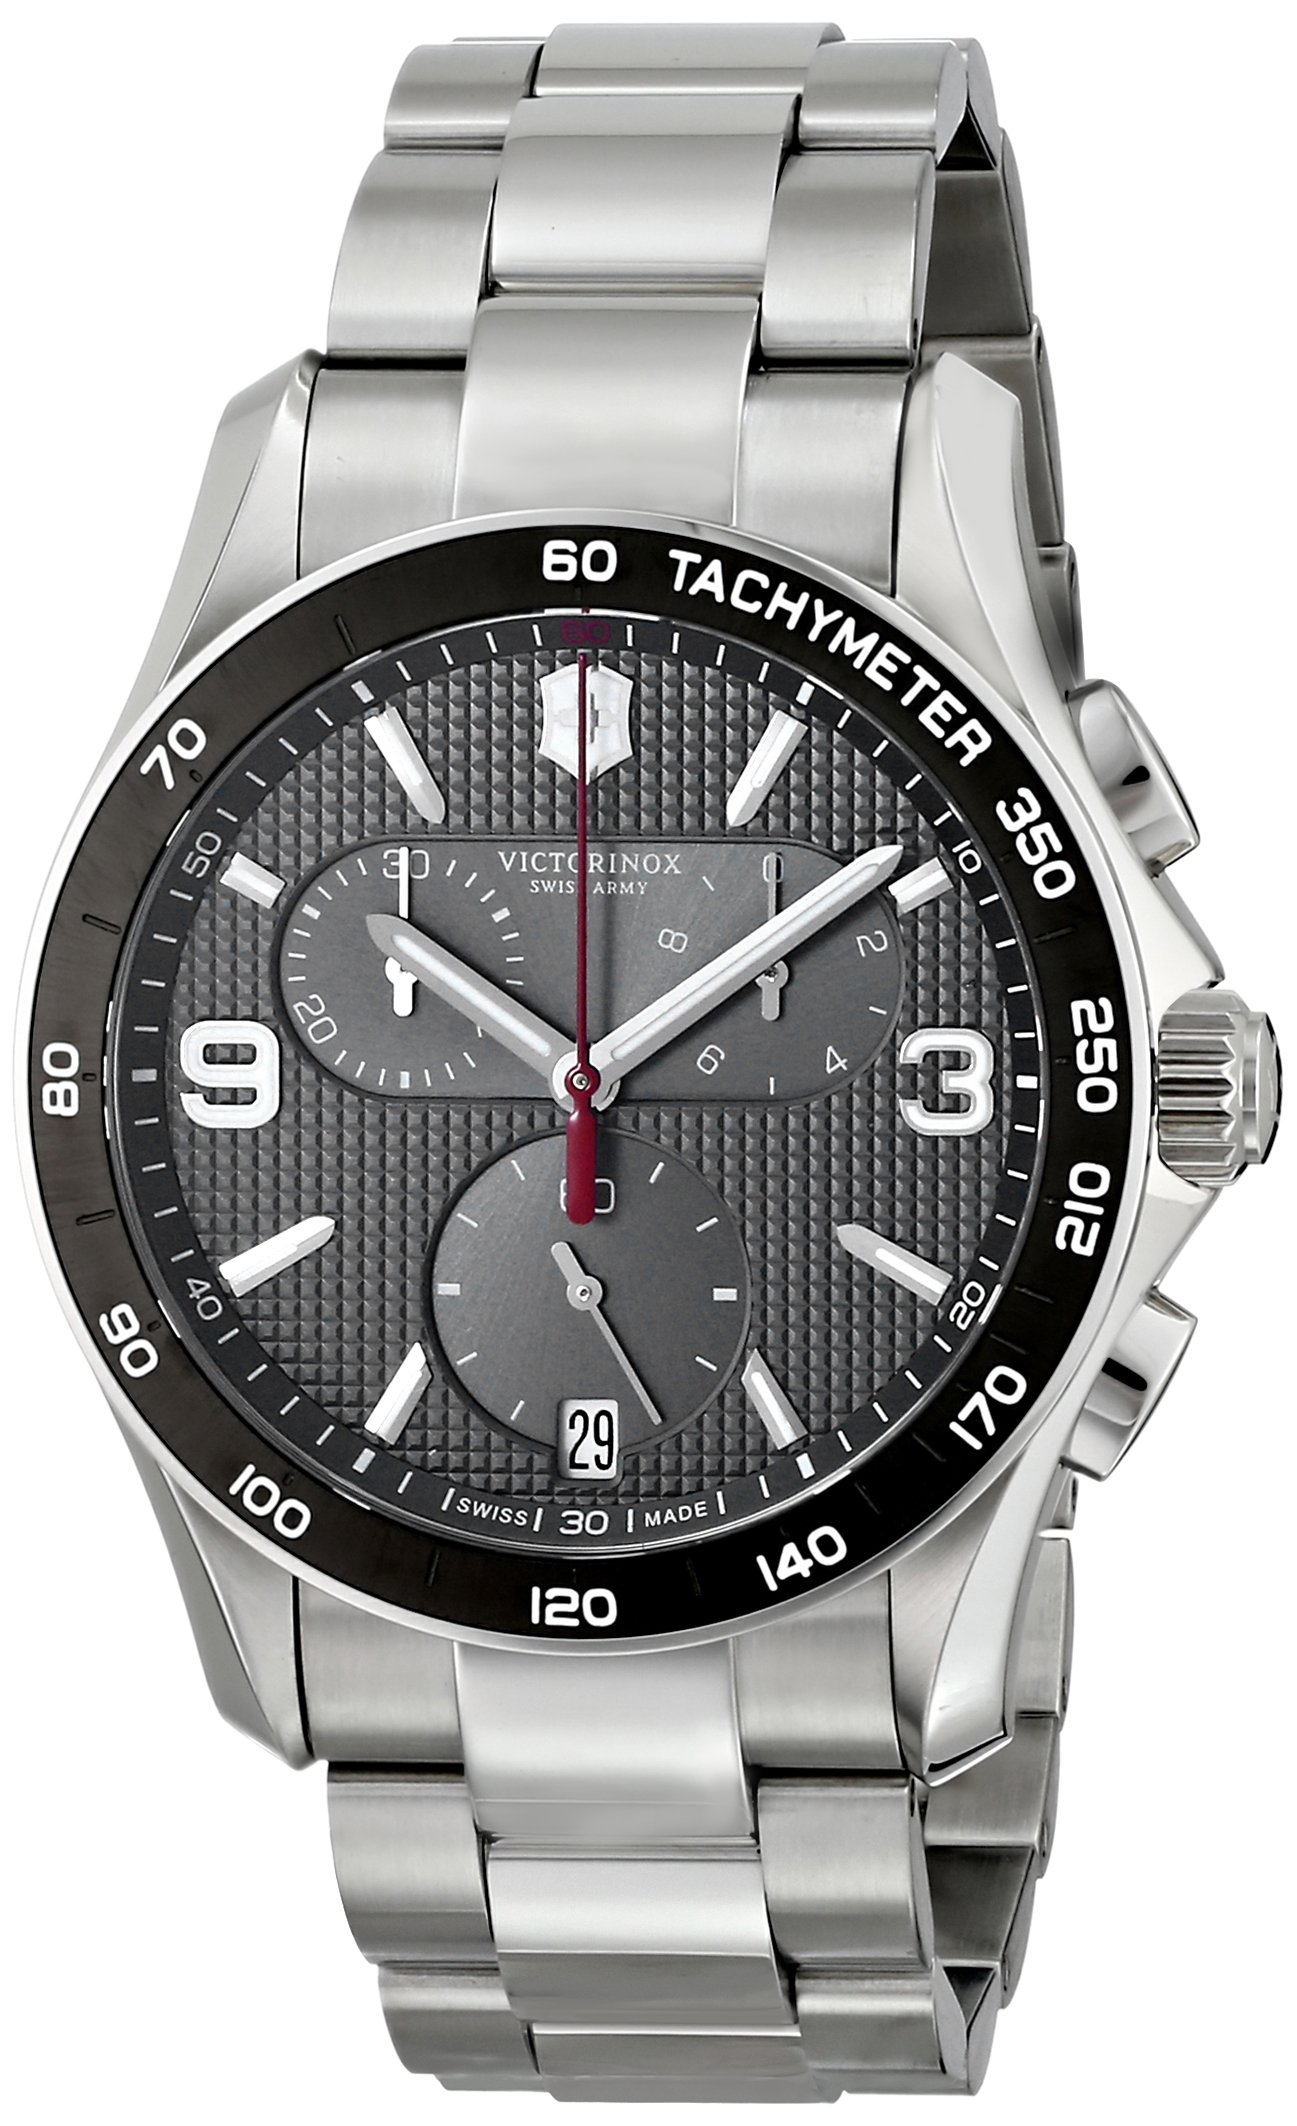 Victorinox Men's 241656 Chrono Classic Stainless Steel Chronograph Watch